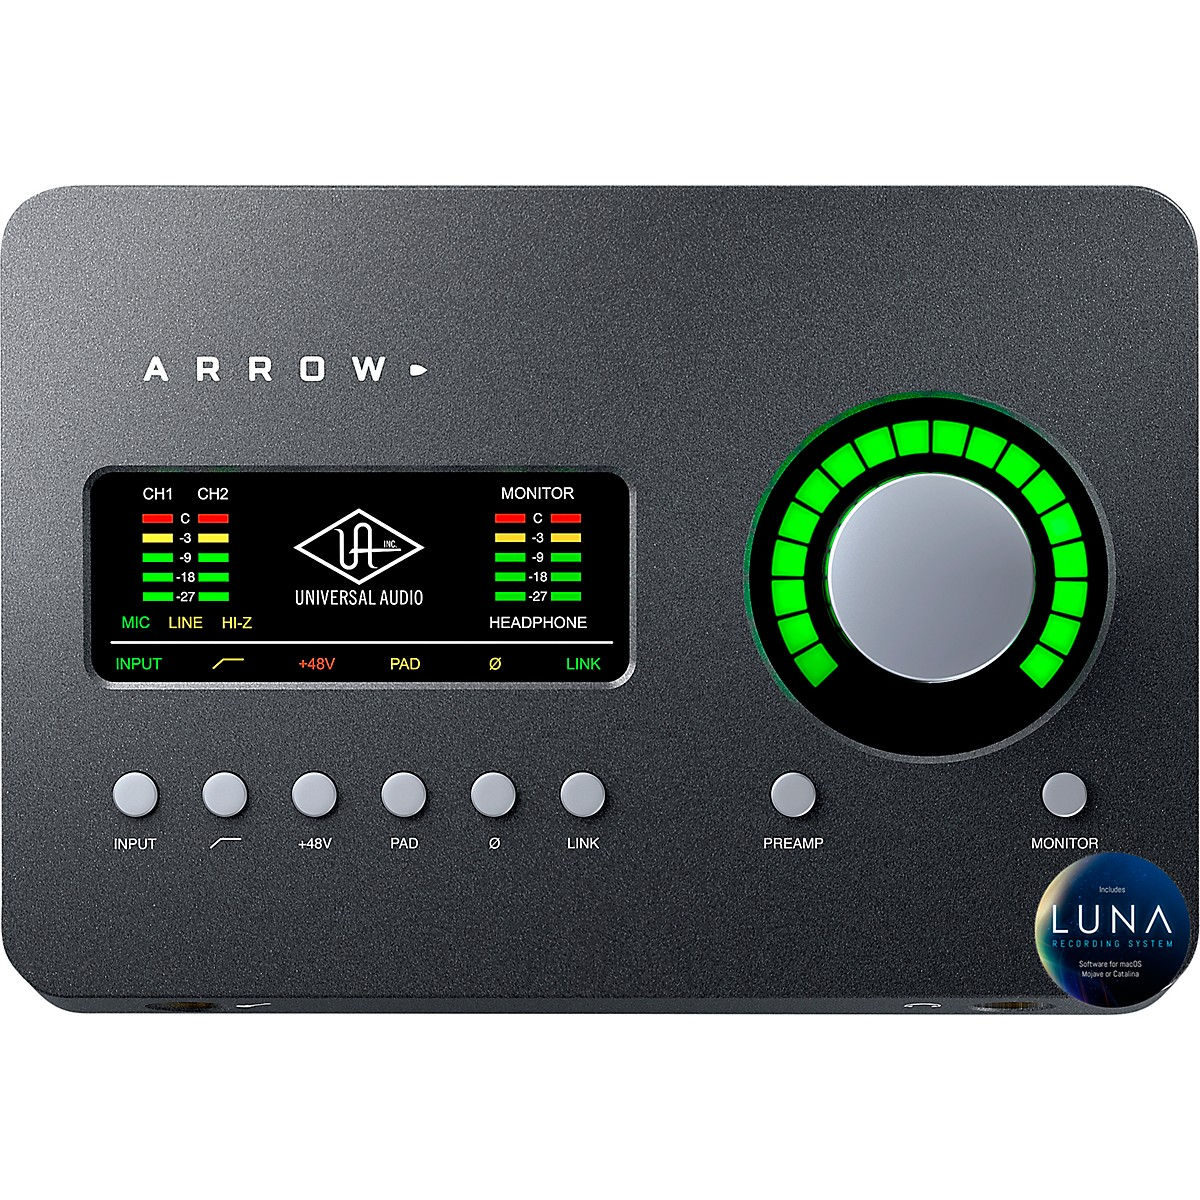 Universal Audio Arrow Audio Interface